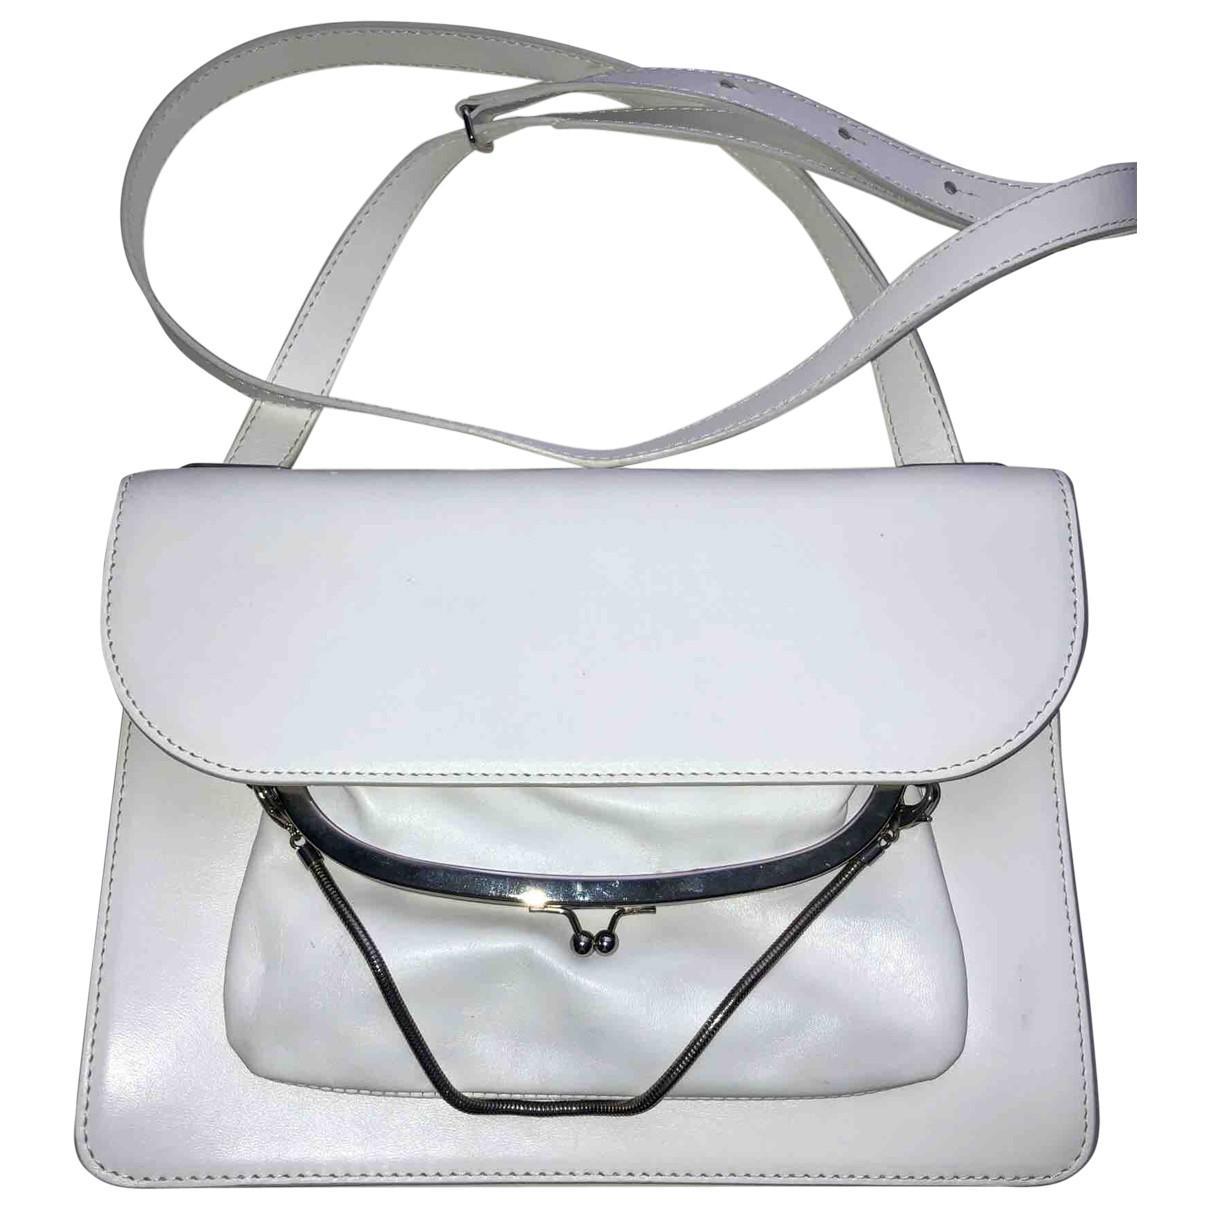 Maison Martin Margiela Pre-owned - Leather bag EL2ppo